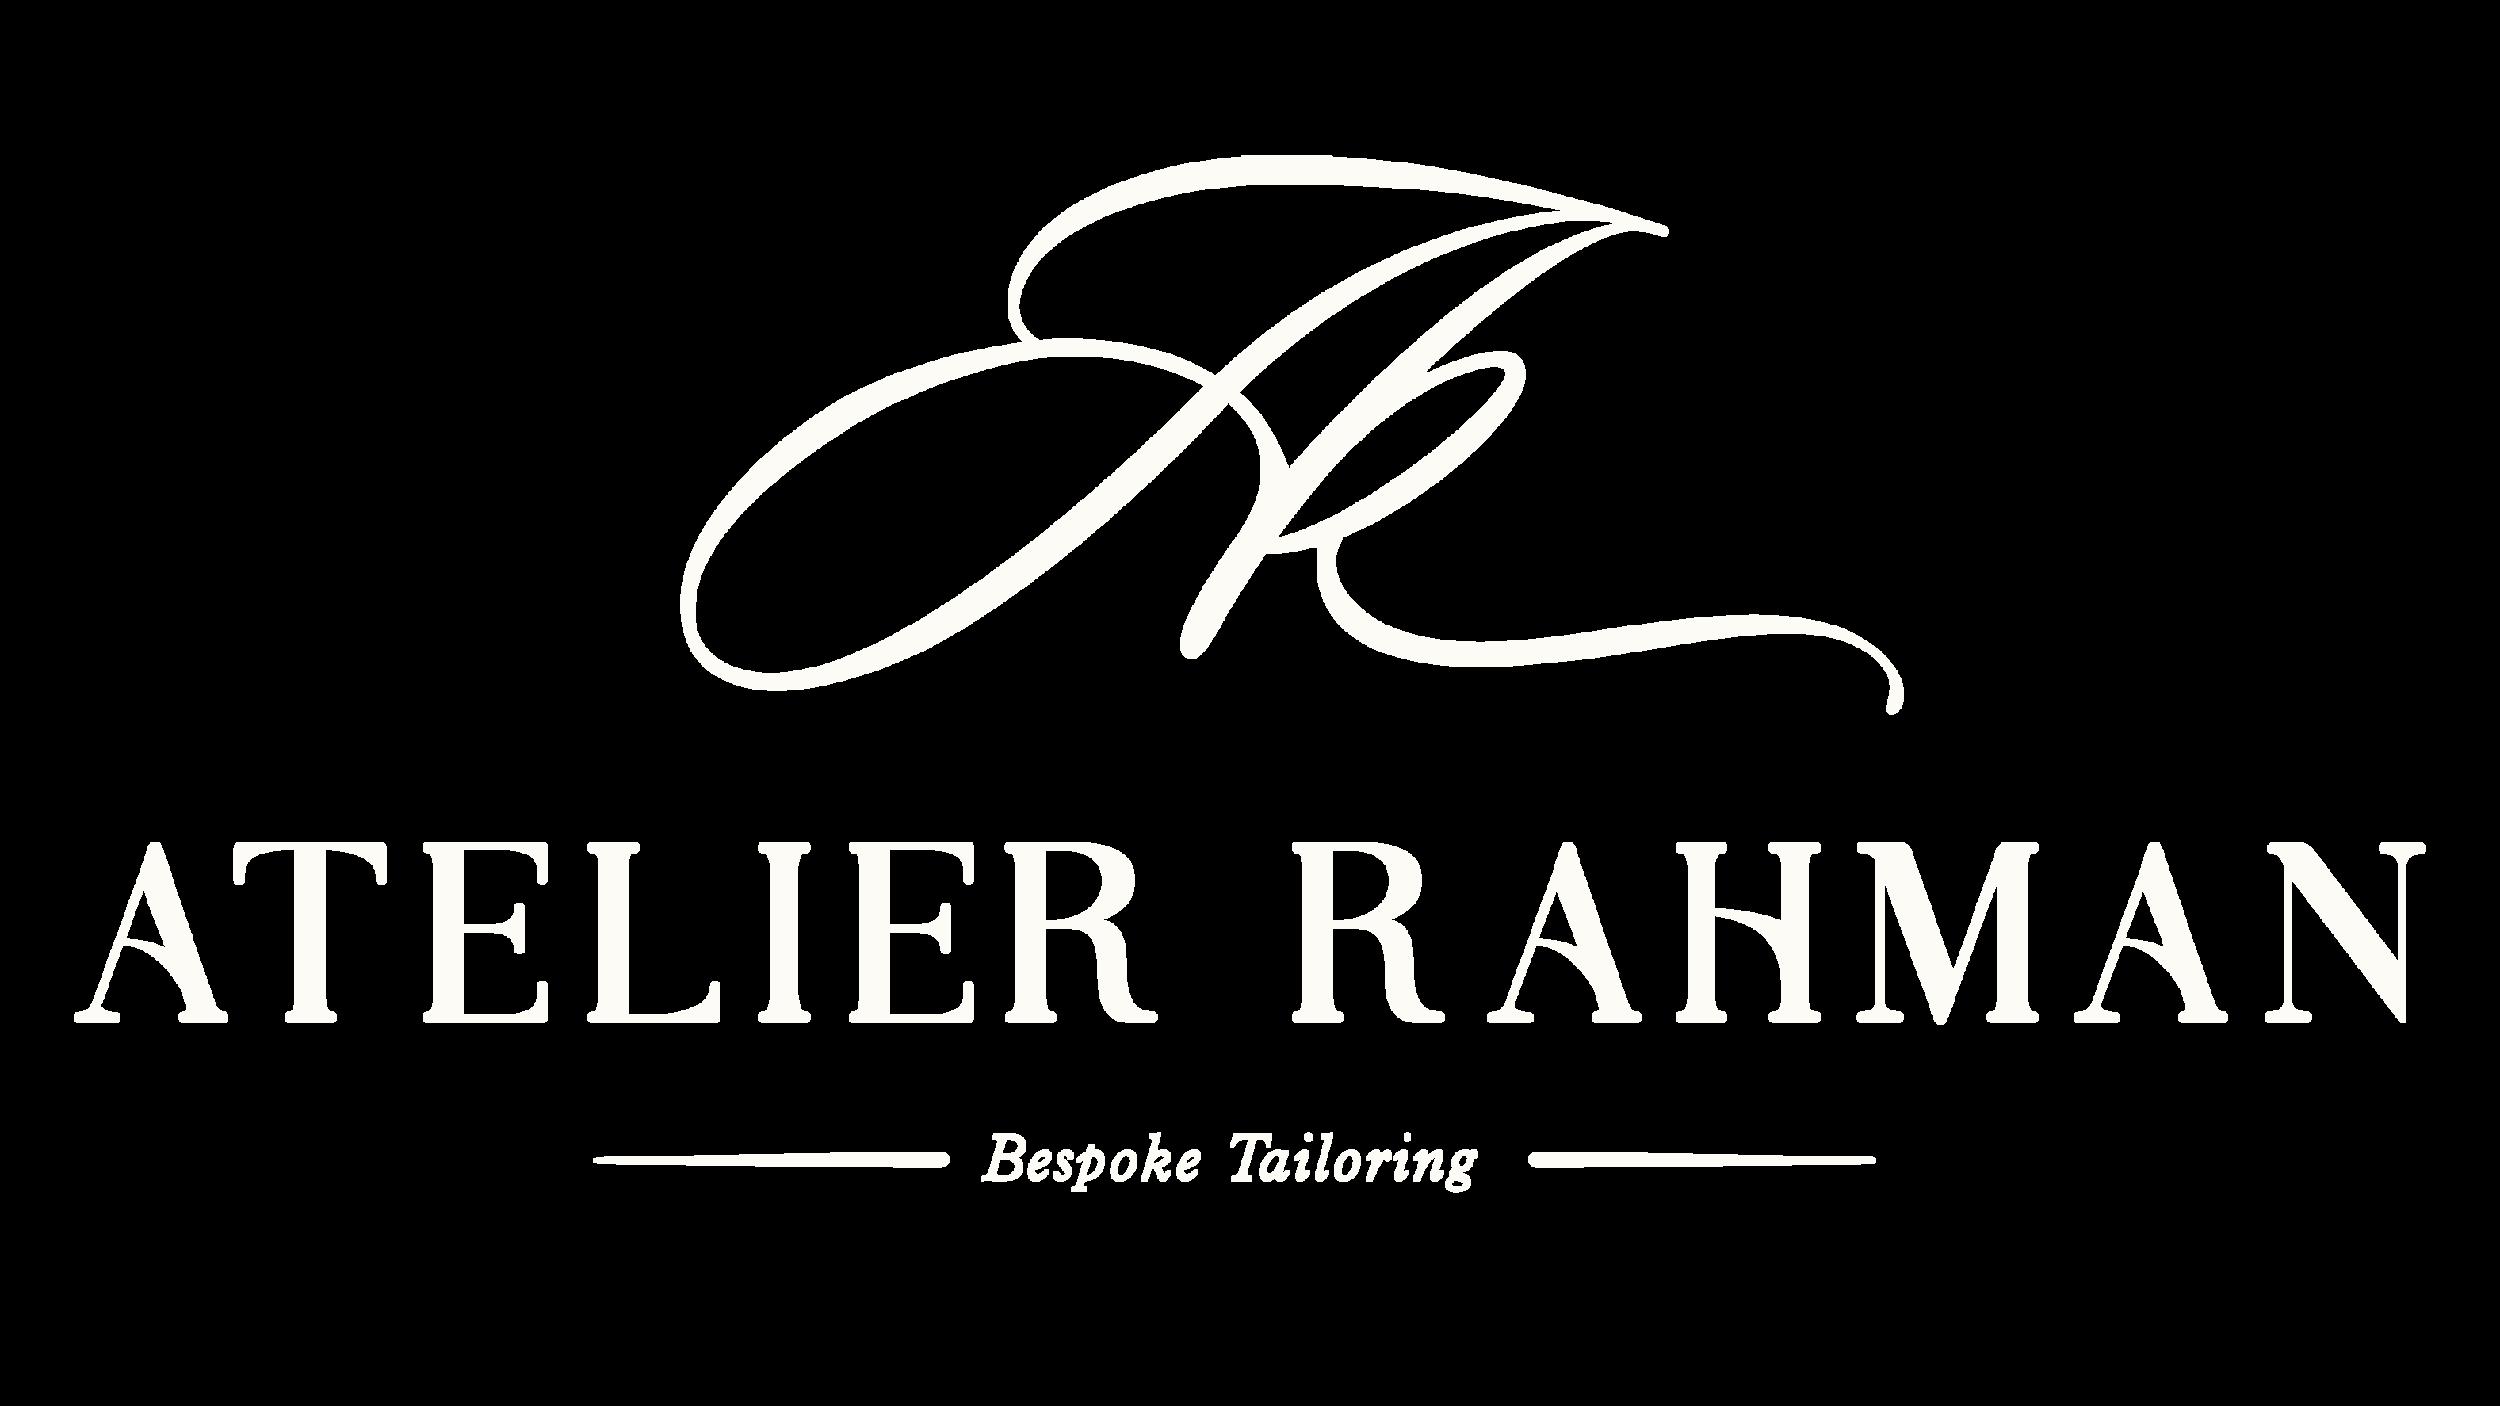 atelier rahman final logo3.png